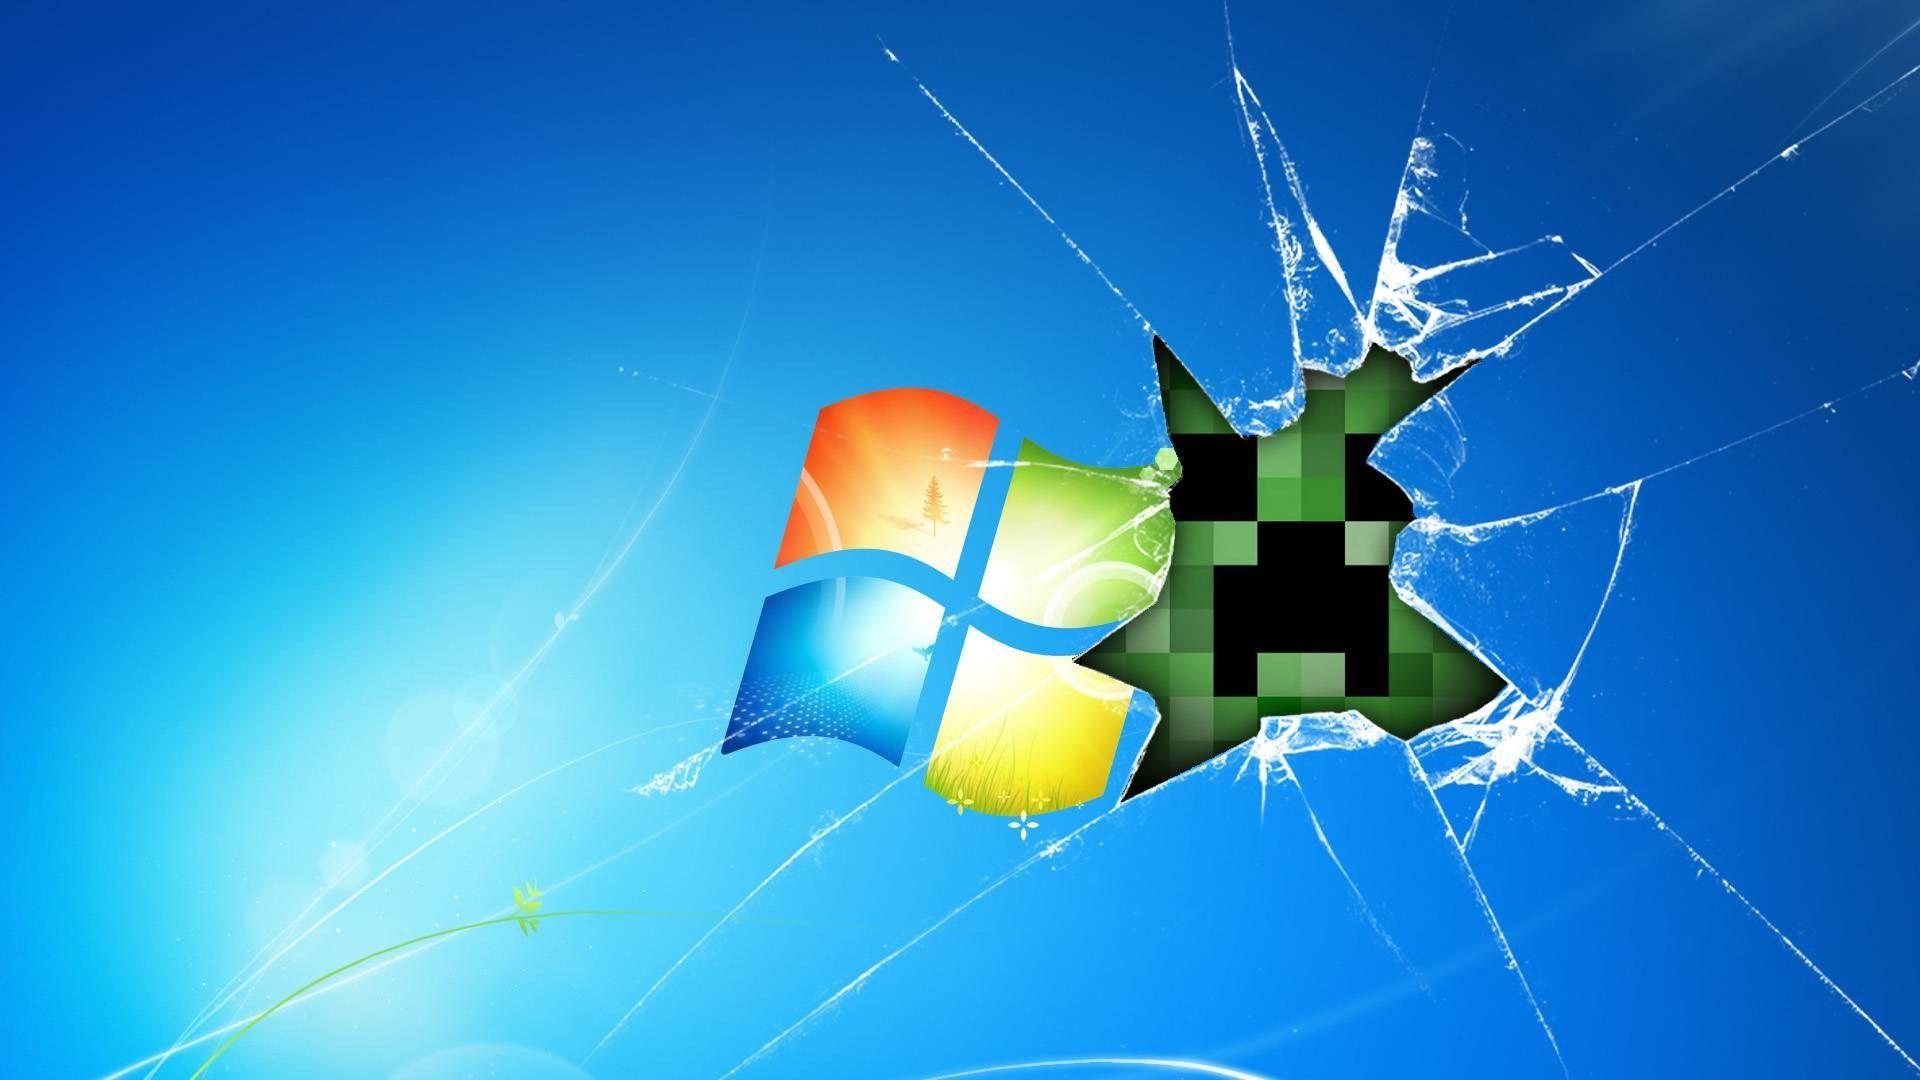 Hd Minecraft Creeper Iphone Wallpaper